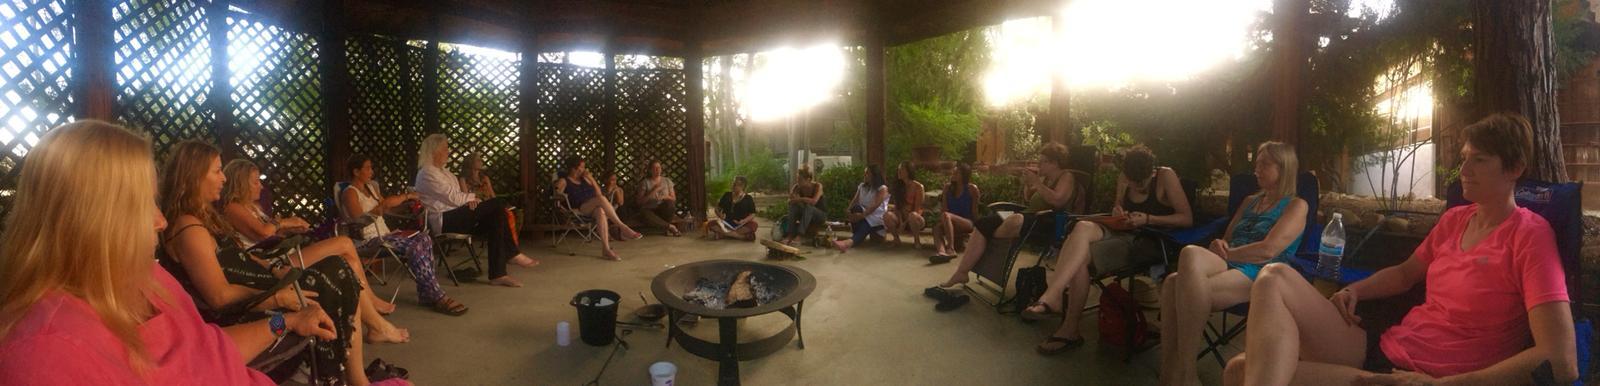 gathering at Manzanita